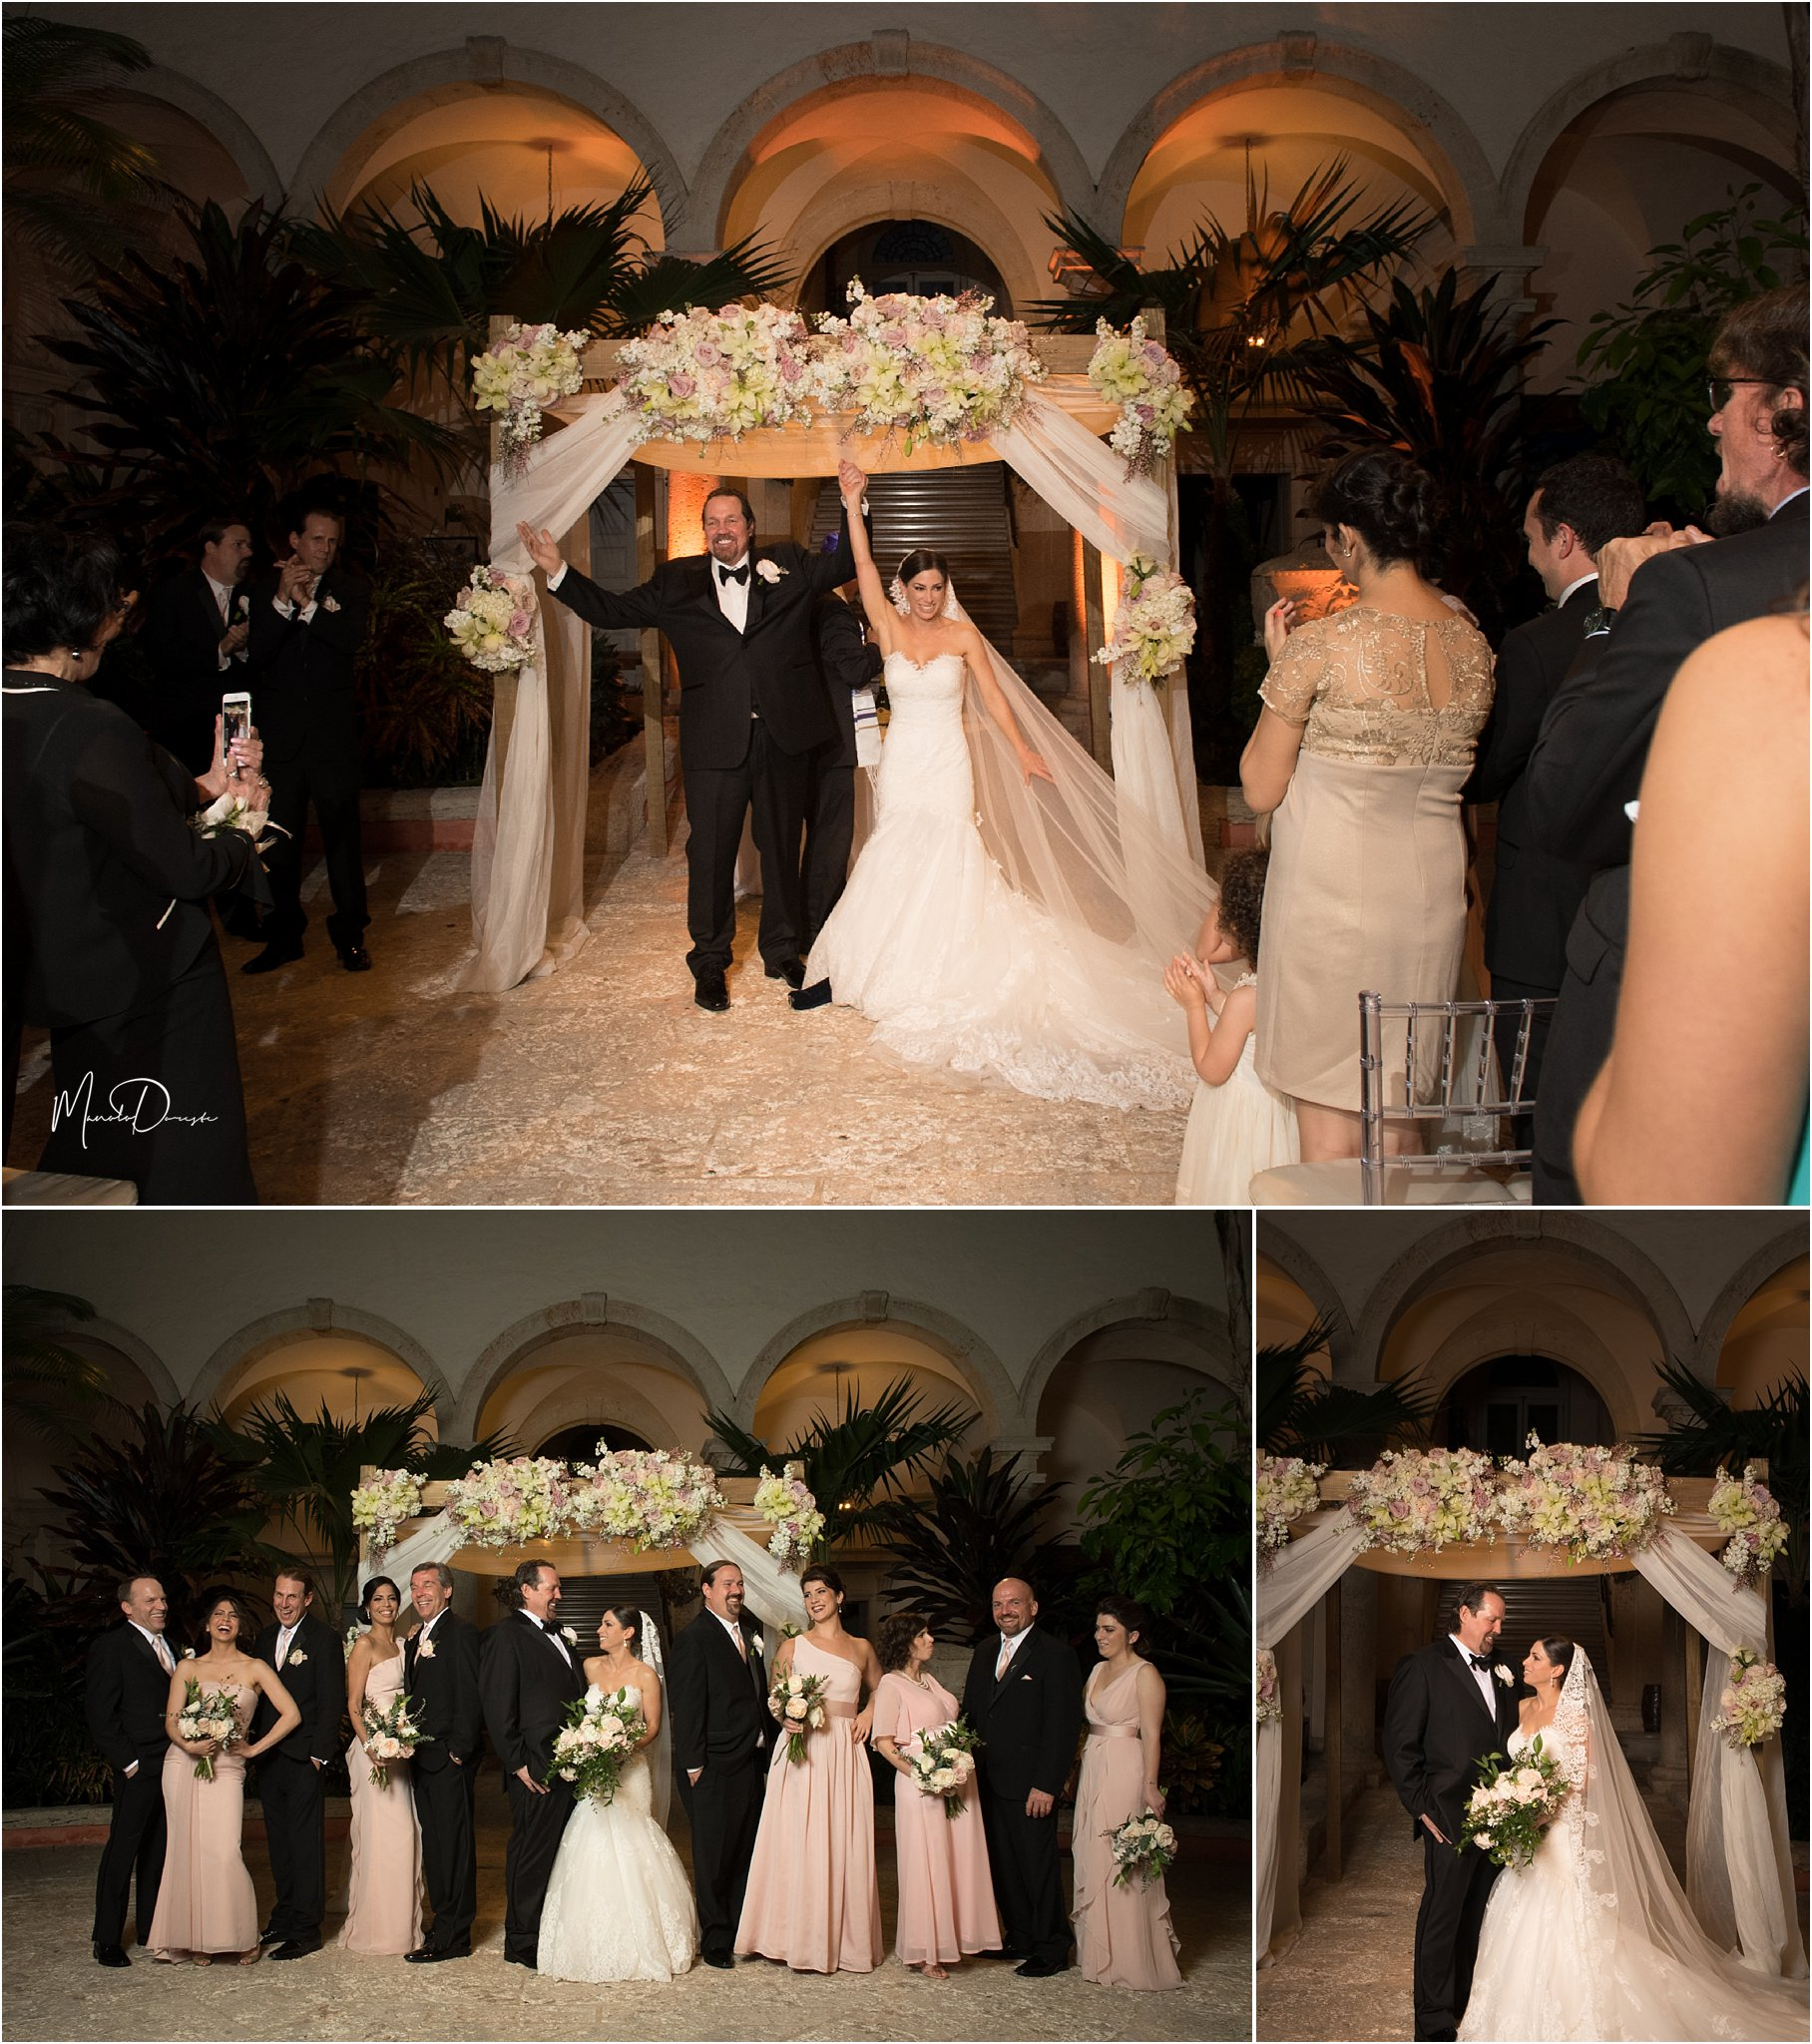 00759_ManoloDoreste_InFocusStudios_Wedding_Family_Photography_Miami_MiamiPhotographer.jpg